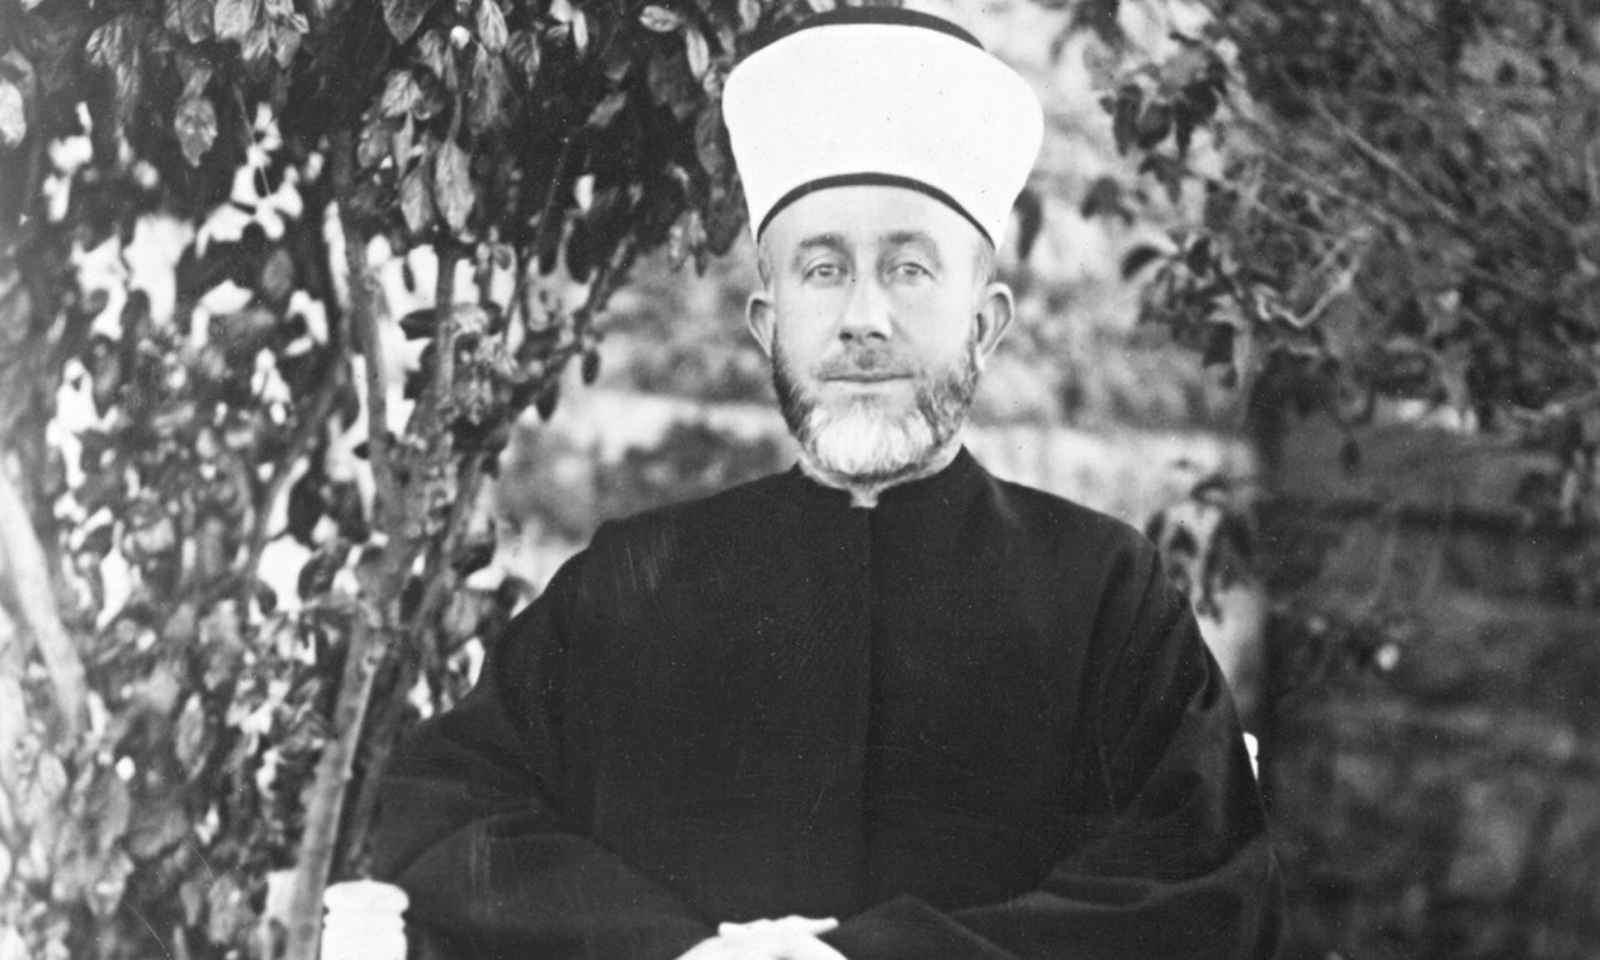 The-Grand-Mufti-of-Jerusa-008